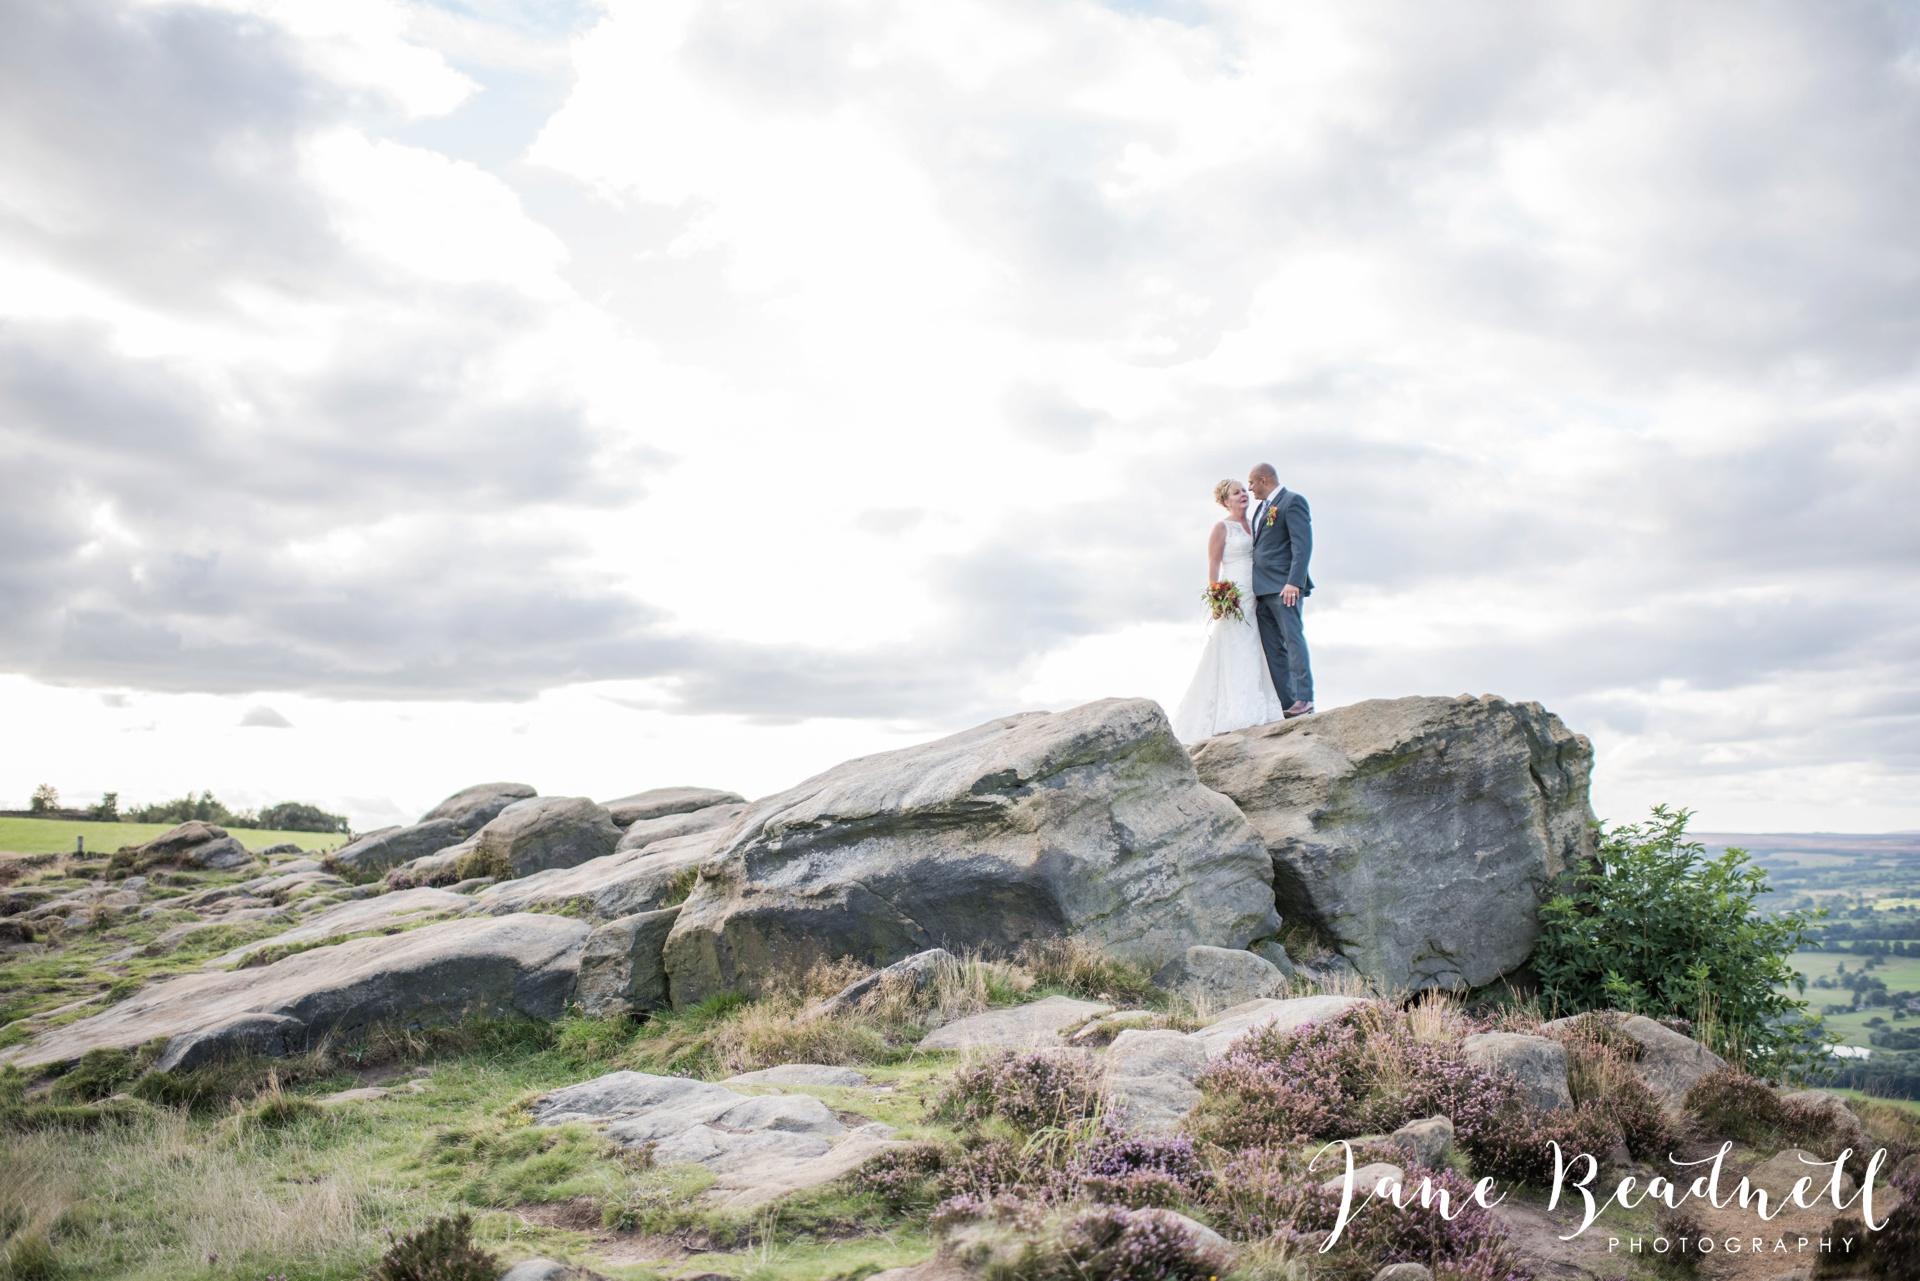 Jane Beadnell photography fine art wedding photographer Leeds_0063